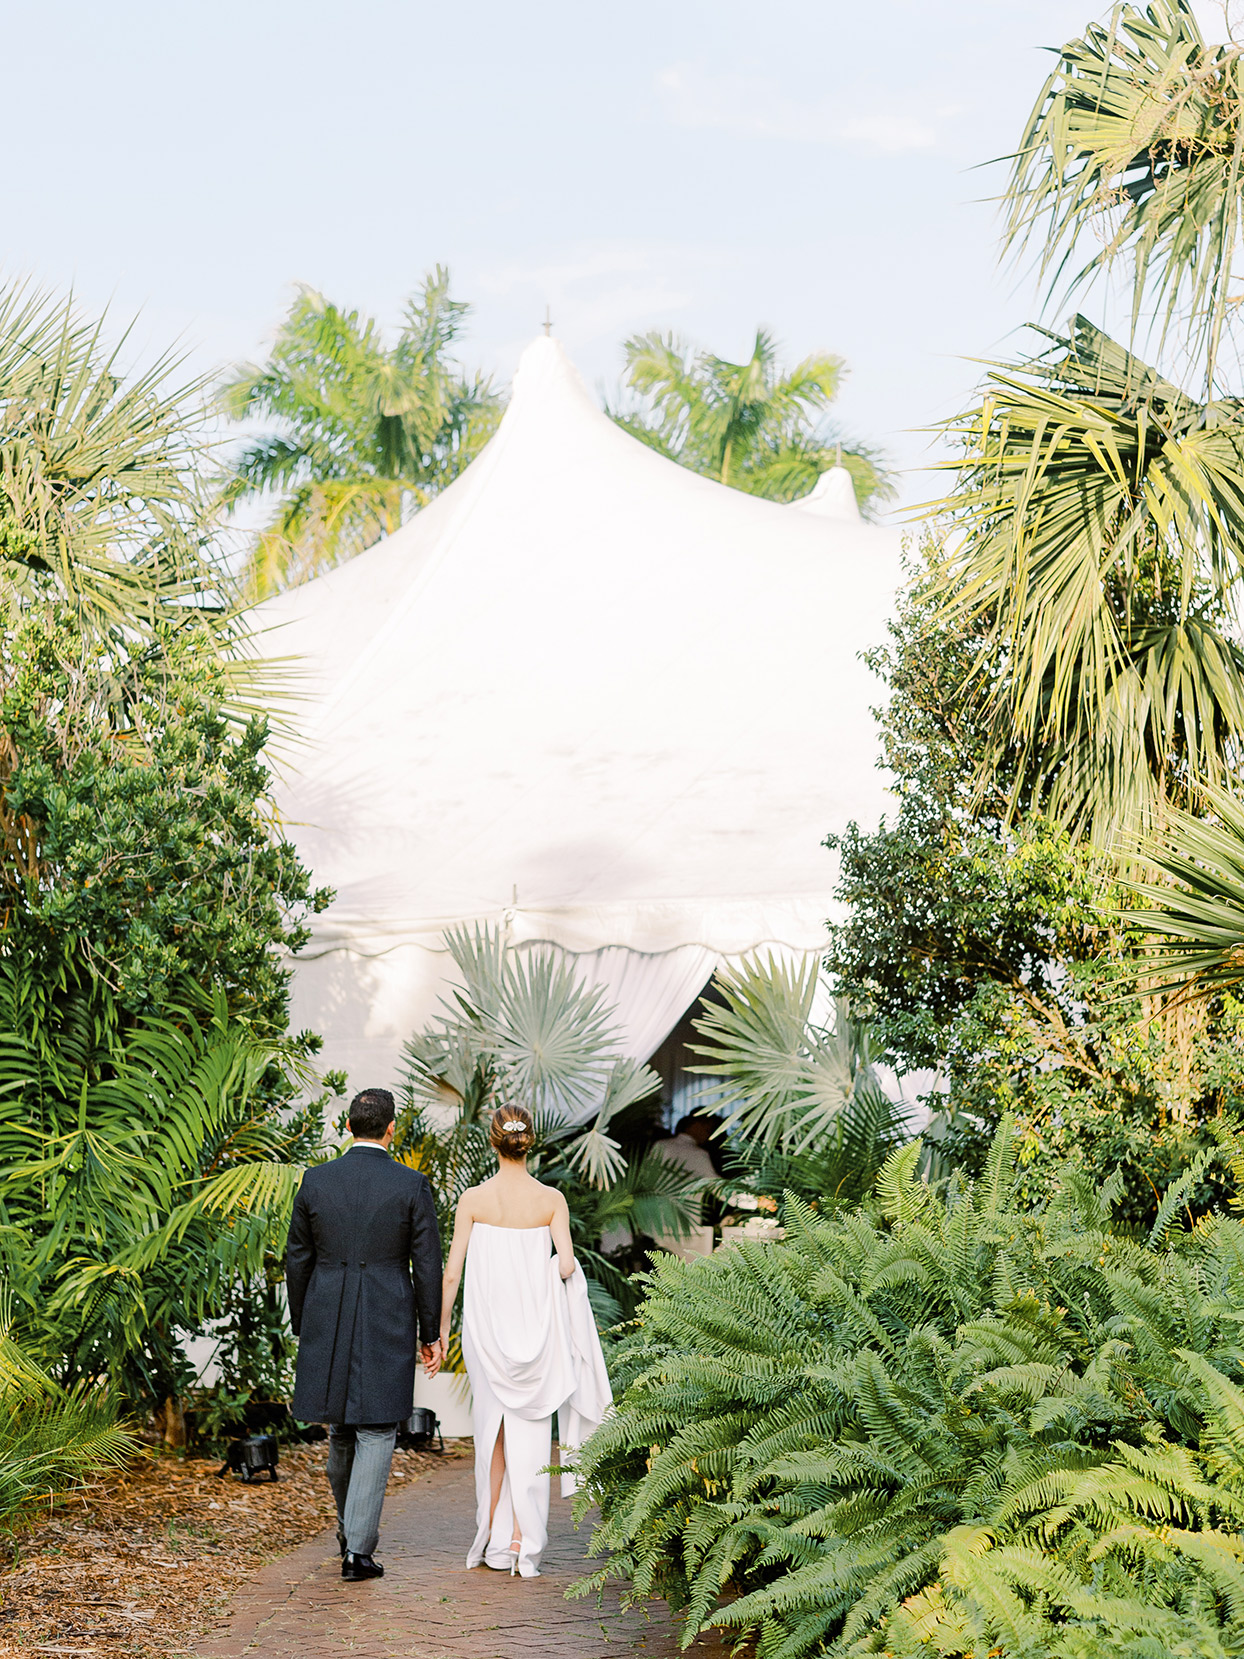 sofia alberto wedding couple entering tent